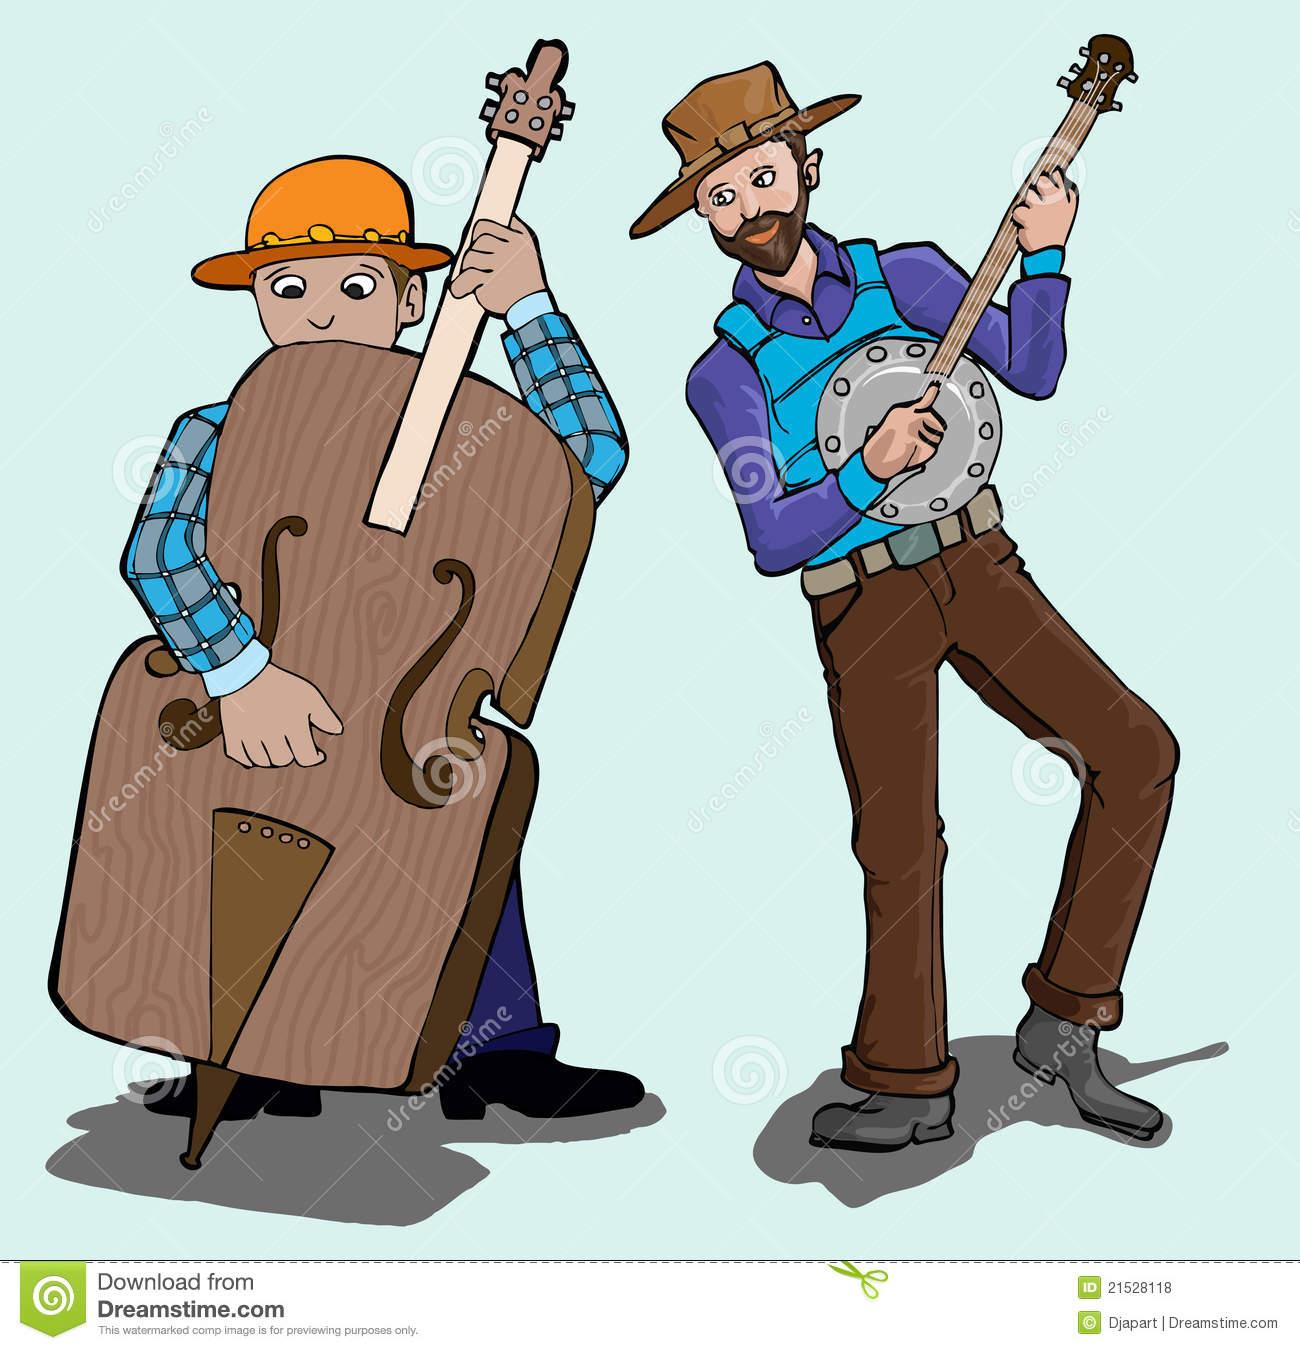 music-series-banjo-contra-bass-player-21528118.jpg